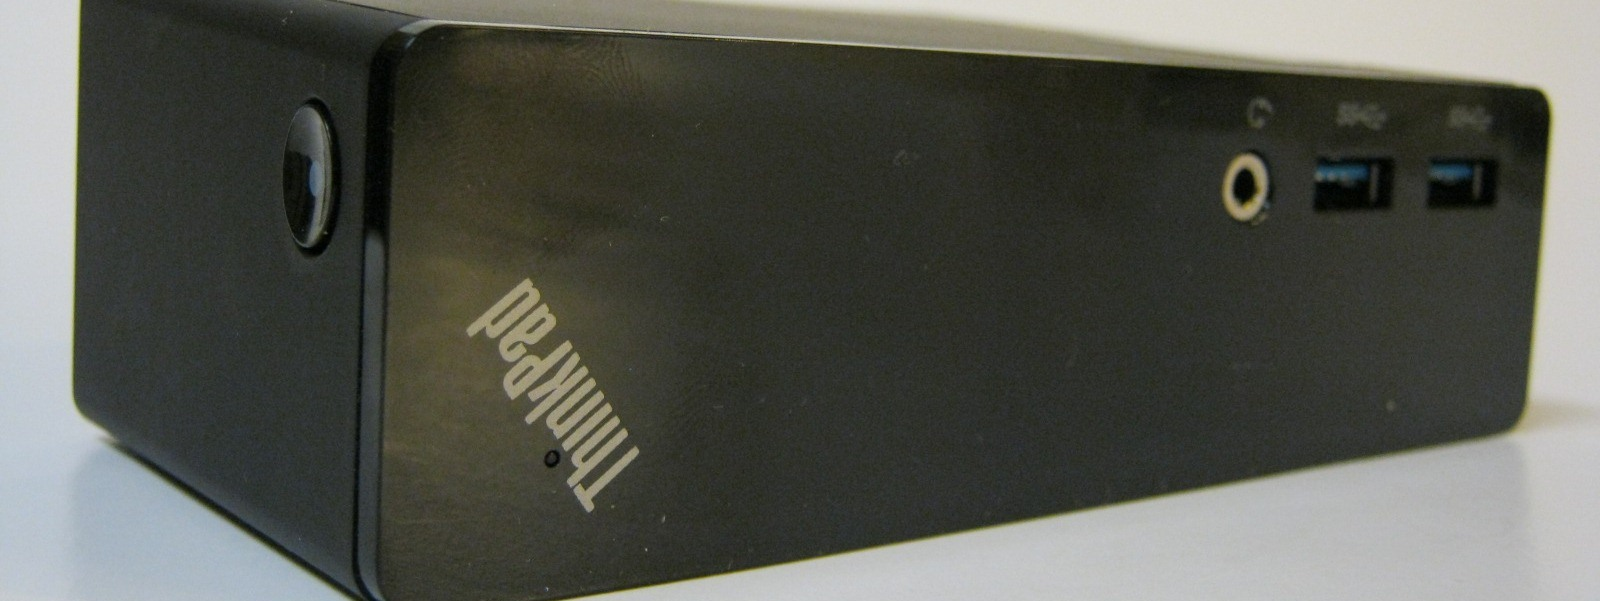 USB Docking Station in Review: Lenovo USB 3 0 Dock 0A33970